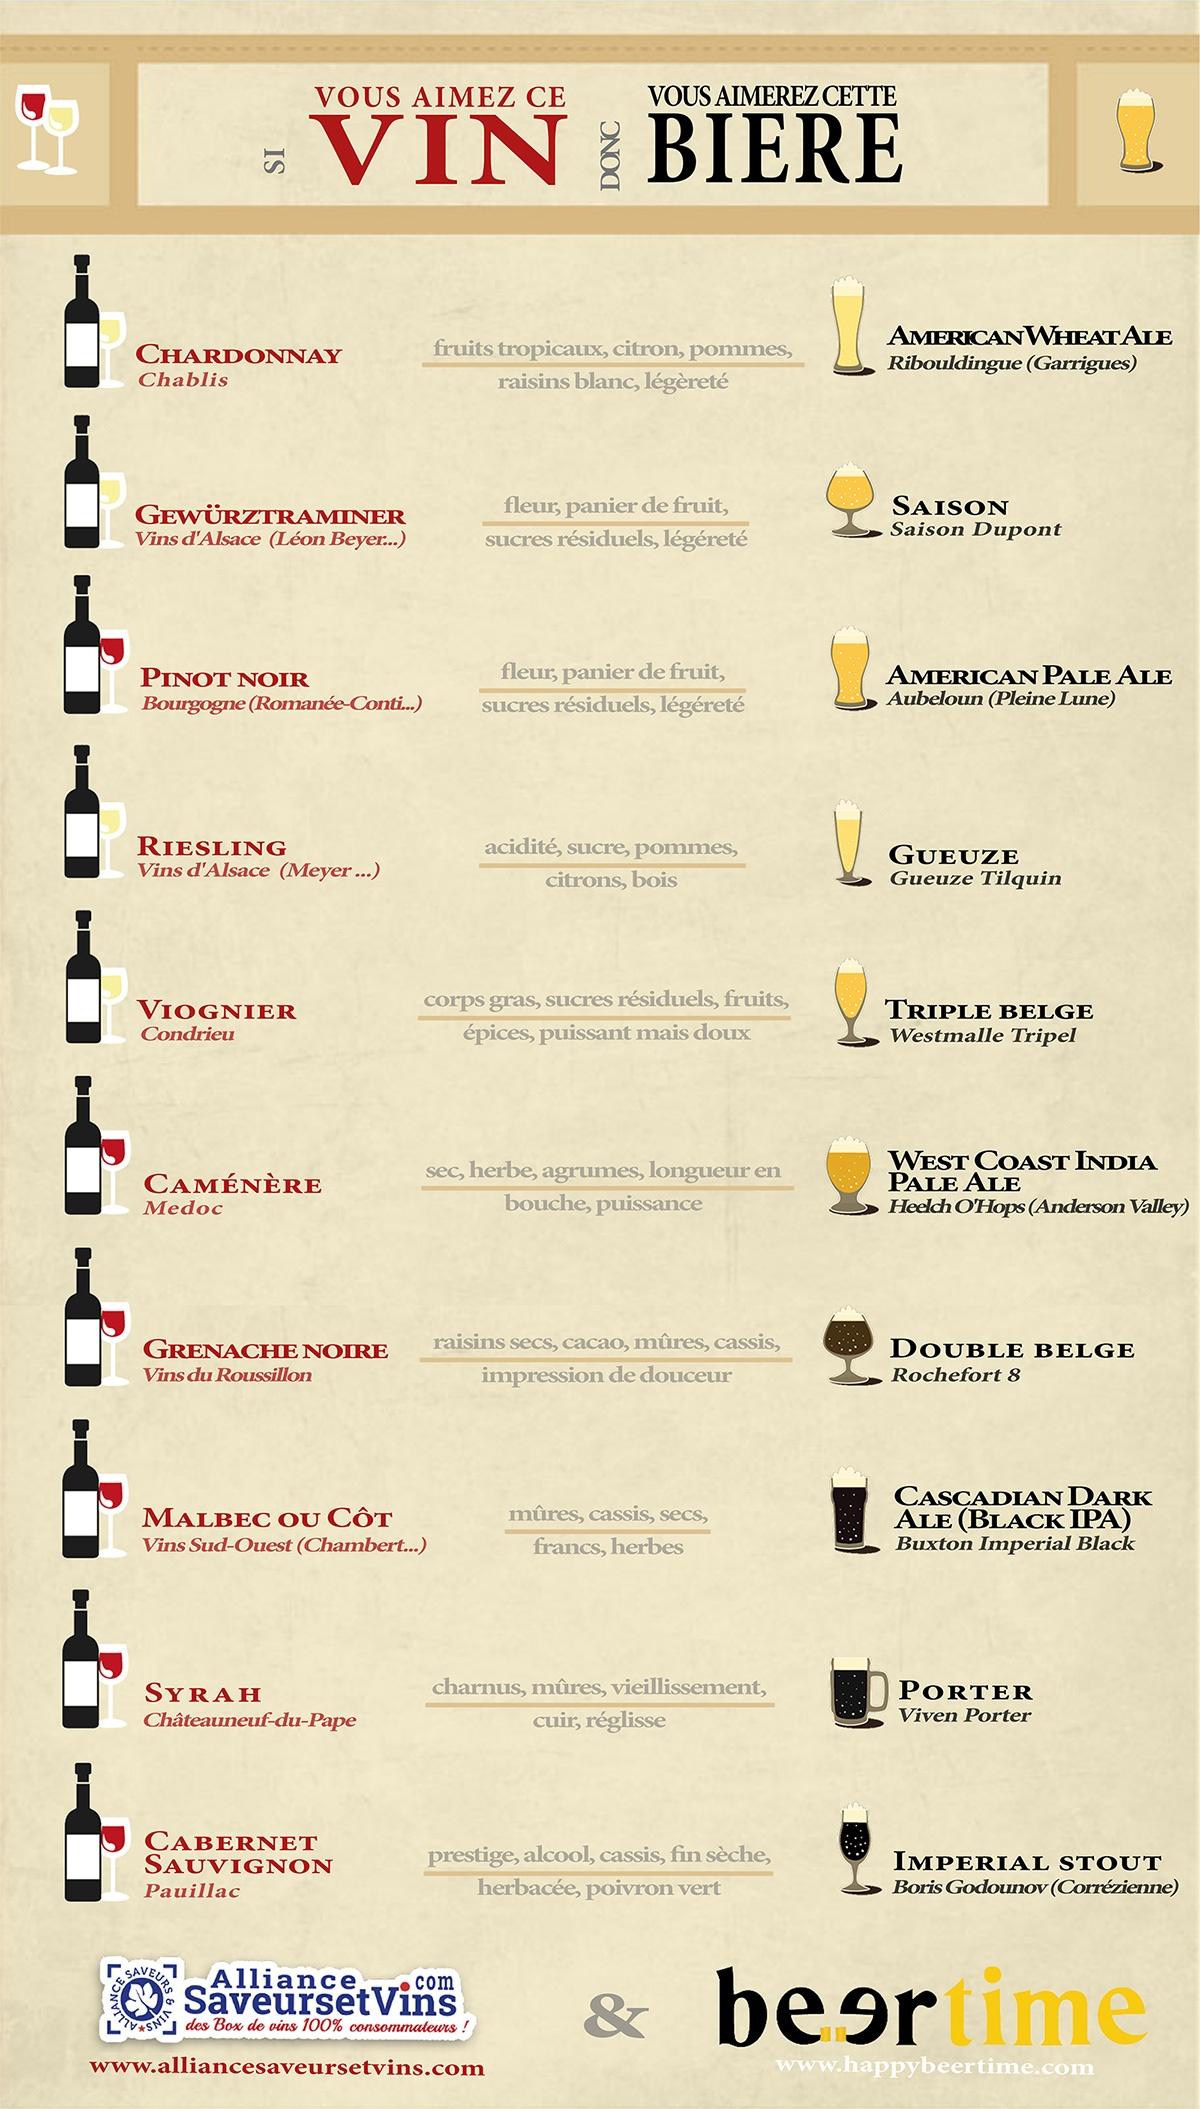 infographie-vin-biere